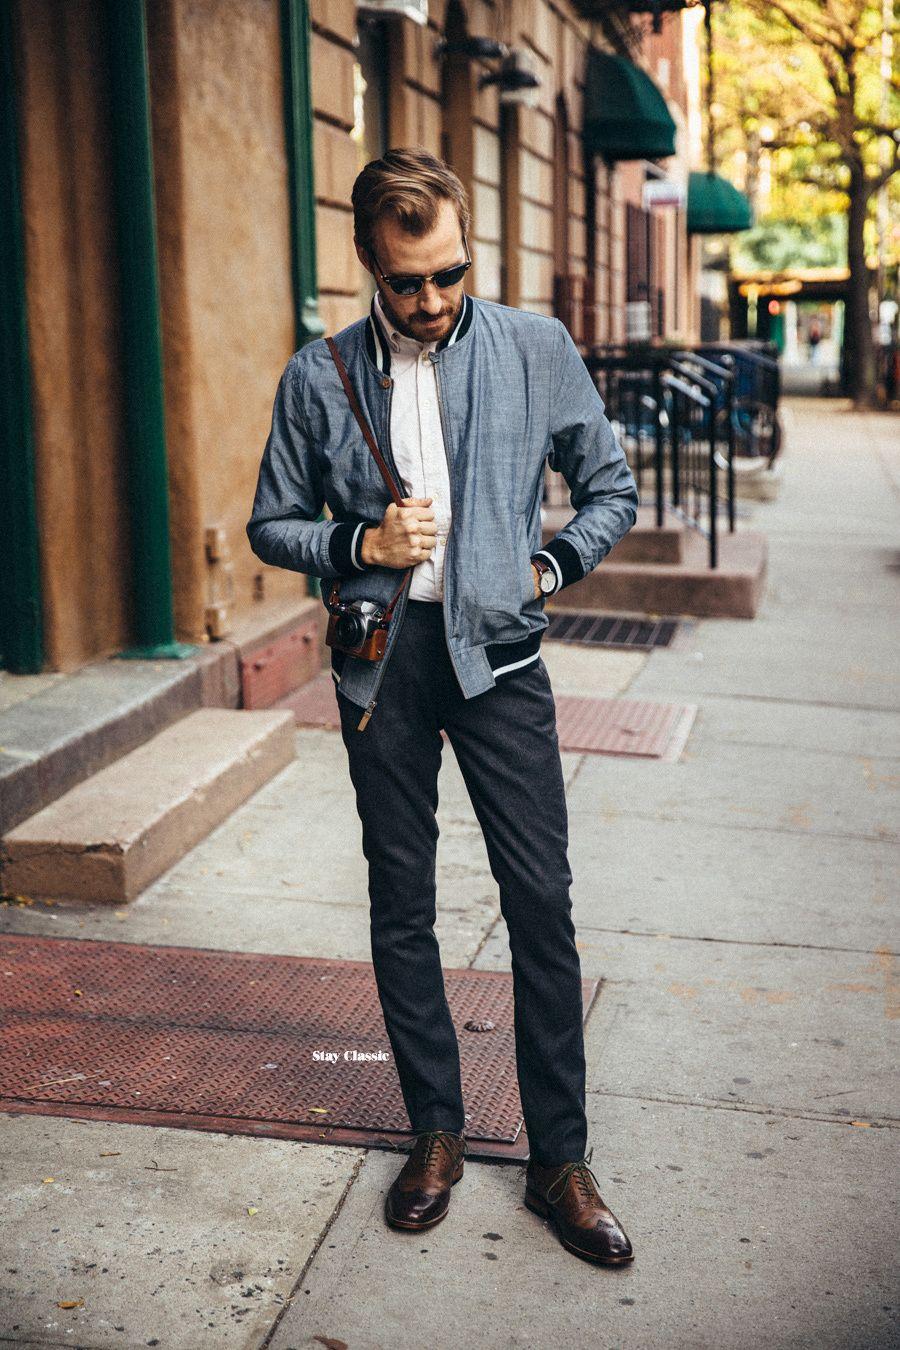 Men S Grey Bomber Jacket White Dress Shirt Charcoal Wool Dress Pants Dark Brown Leather Brogues Jackets Men Fashion Grey Bomber Jacket Mens Outfits [ 1350 x 900 Pixel ]